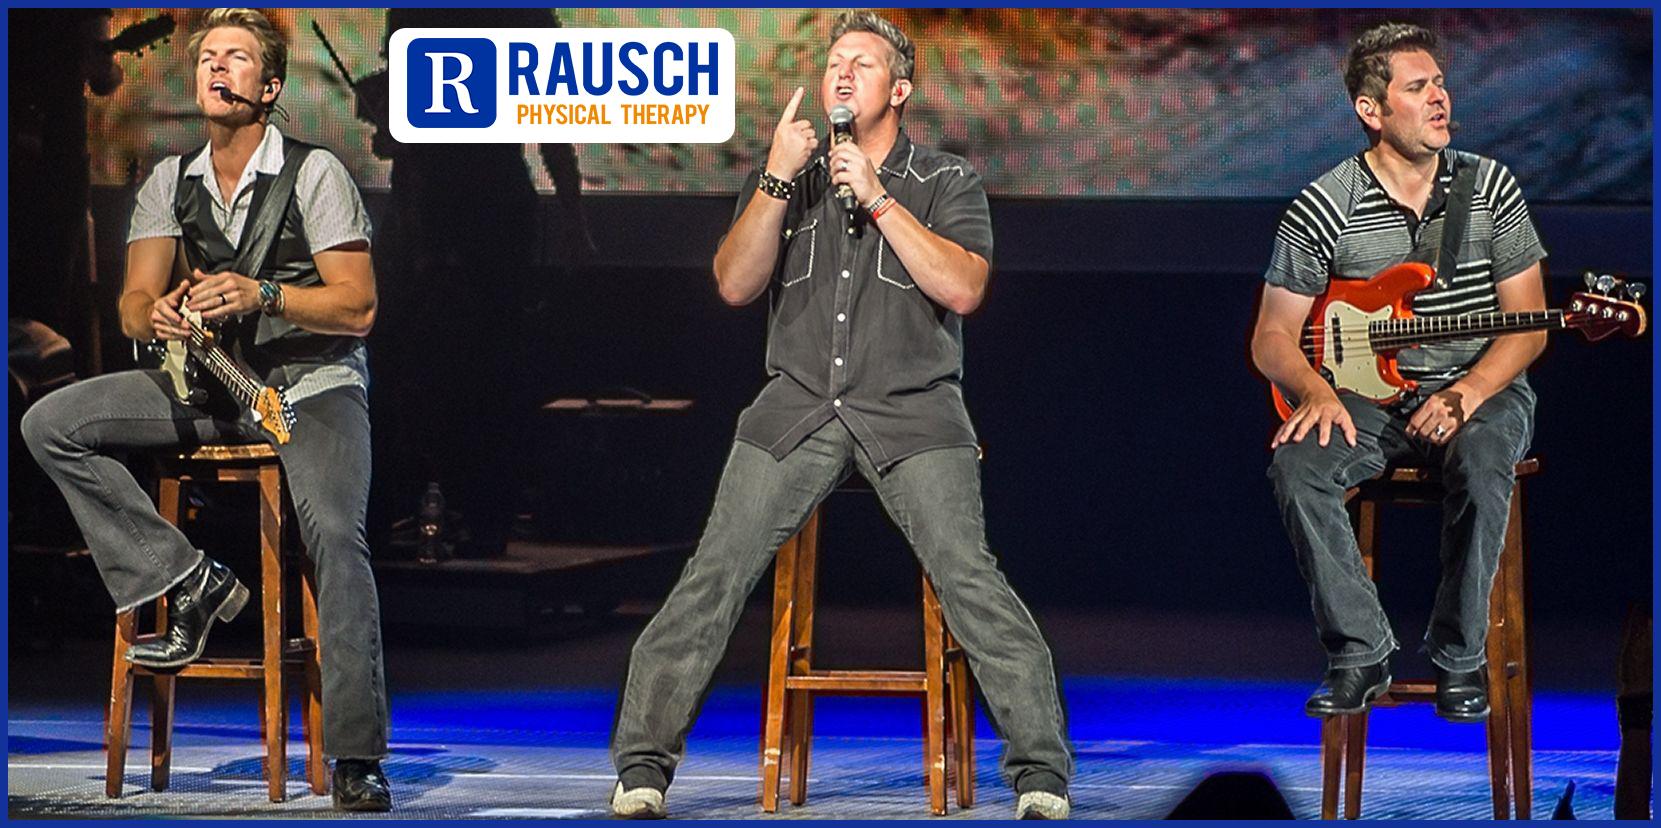 Live in Phoenix Sept. 12, 2013